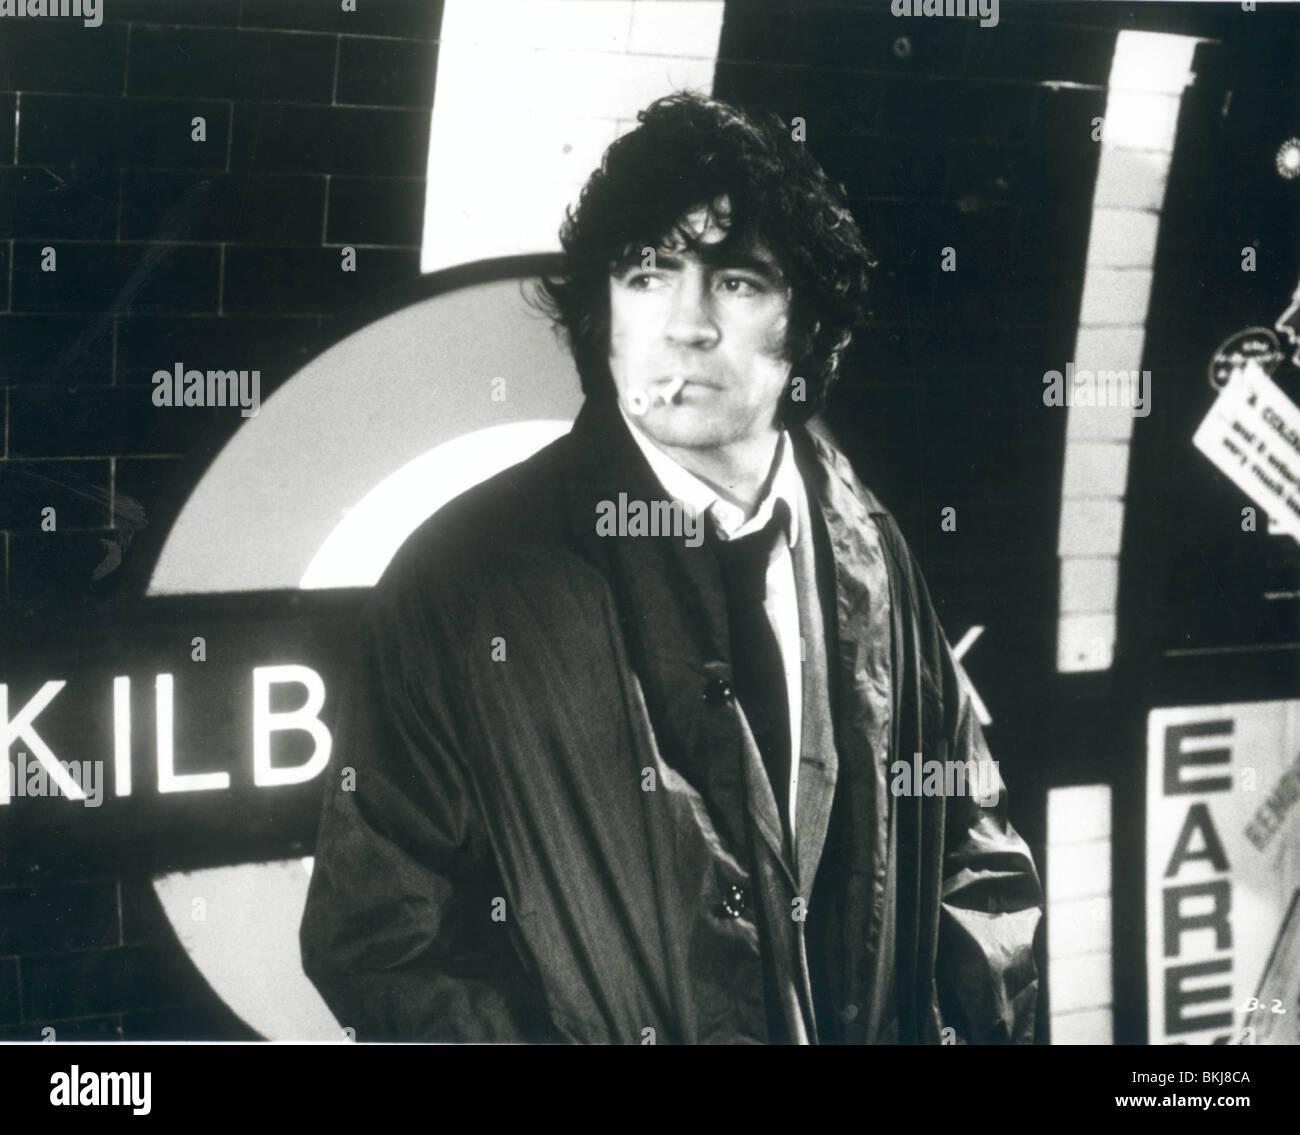 BUTLEY -1973 ALAN BATES - Stock Image